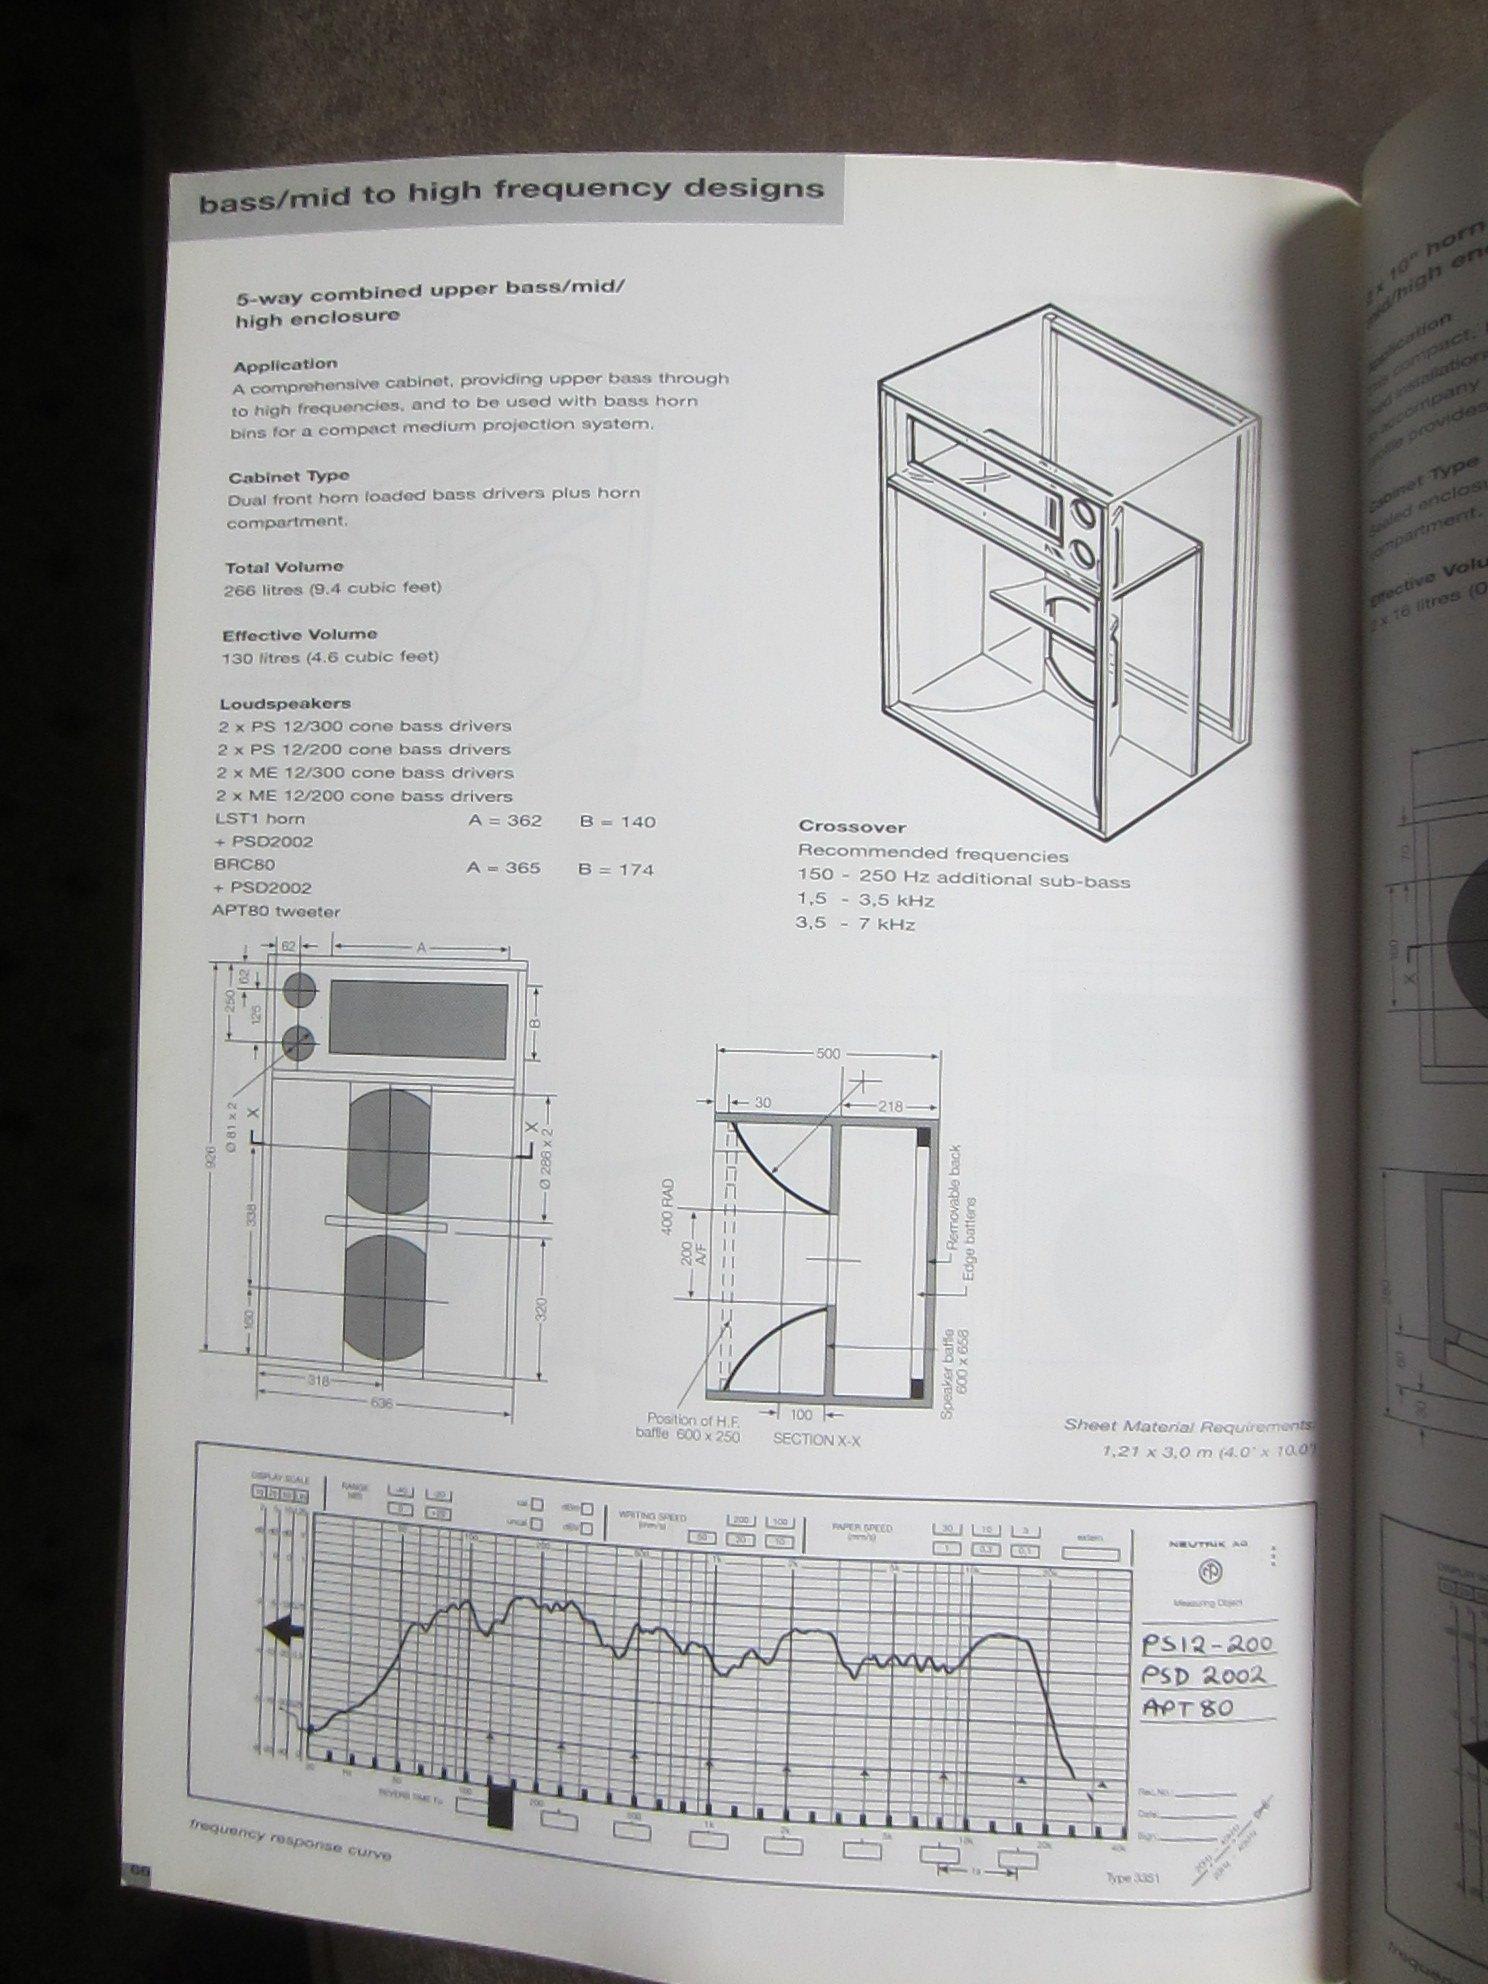 Eminence High Power Loudspeaker Enclosure Design And Construction Adam Hall 9780951825204 Amazon Com Books